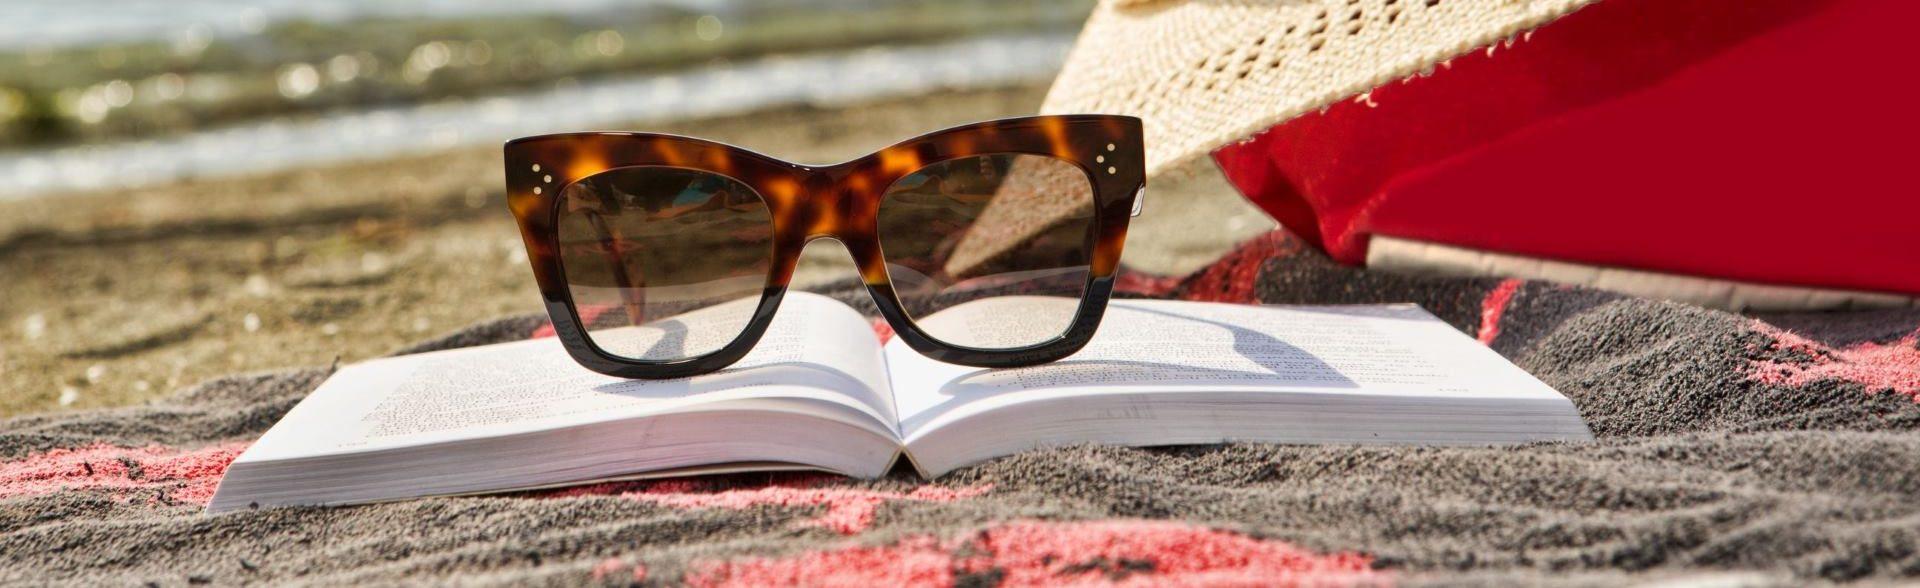 GHETALDUS SPLIT Idealan par sunčanih naočala više je od trendi dizajna